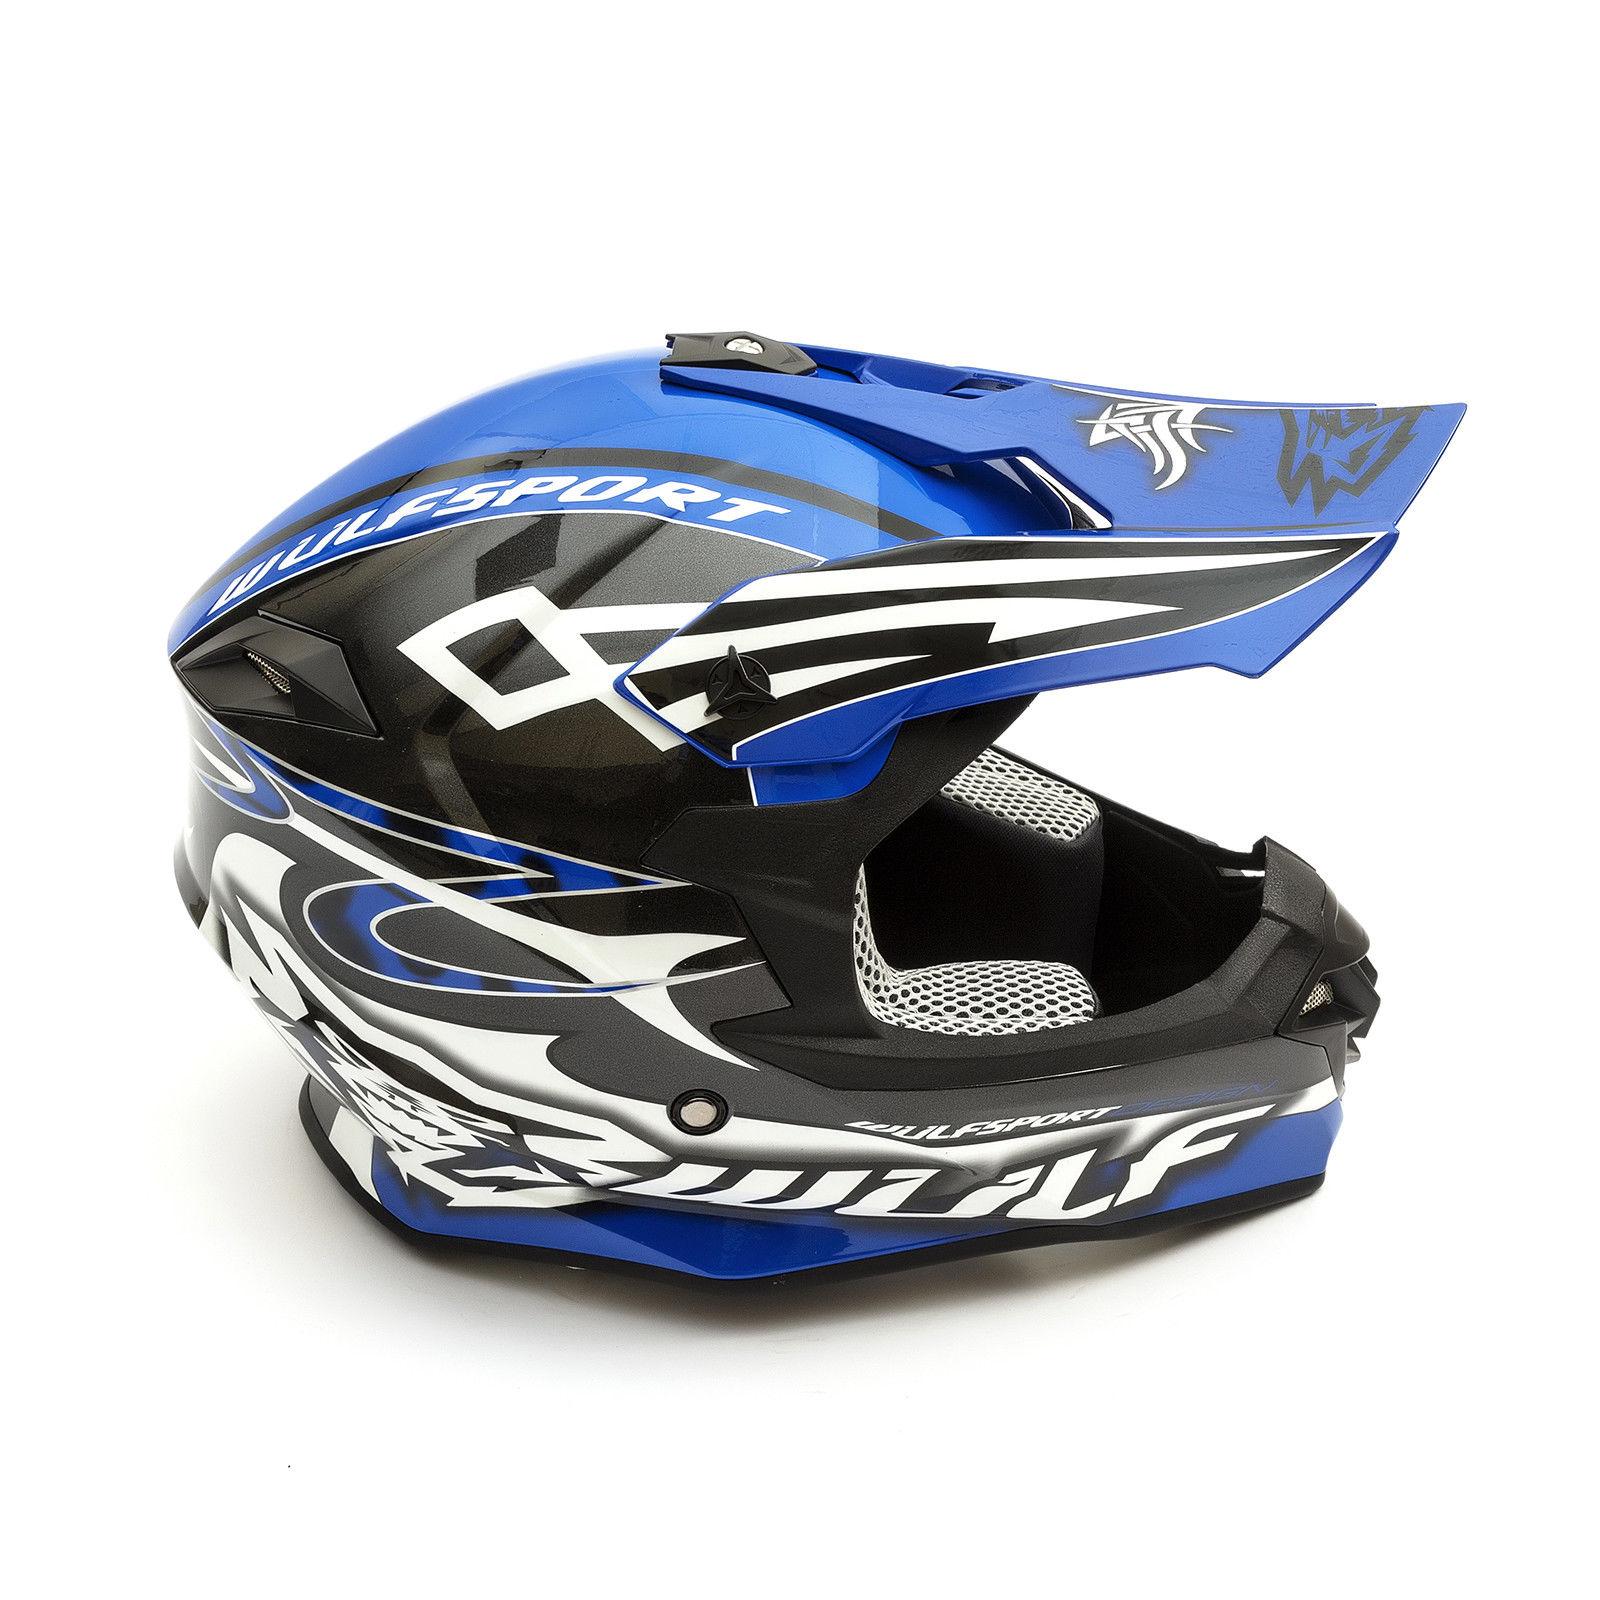 Wulfsport-Adult-Sceptre-Helmets-Motocross-Pitbike-Motorbike-Off-Road-Racing-ATV thumbnail 20